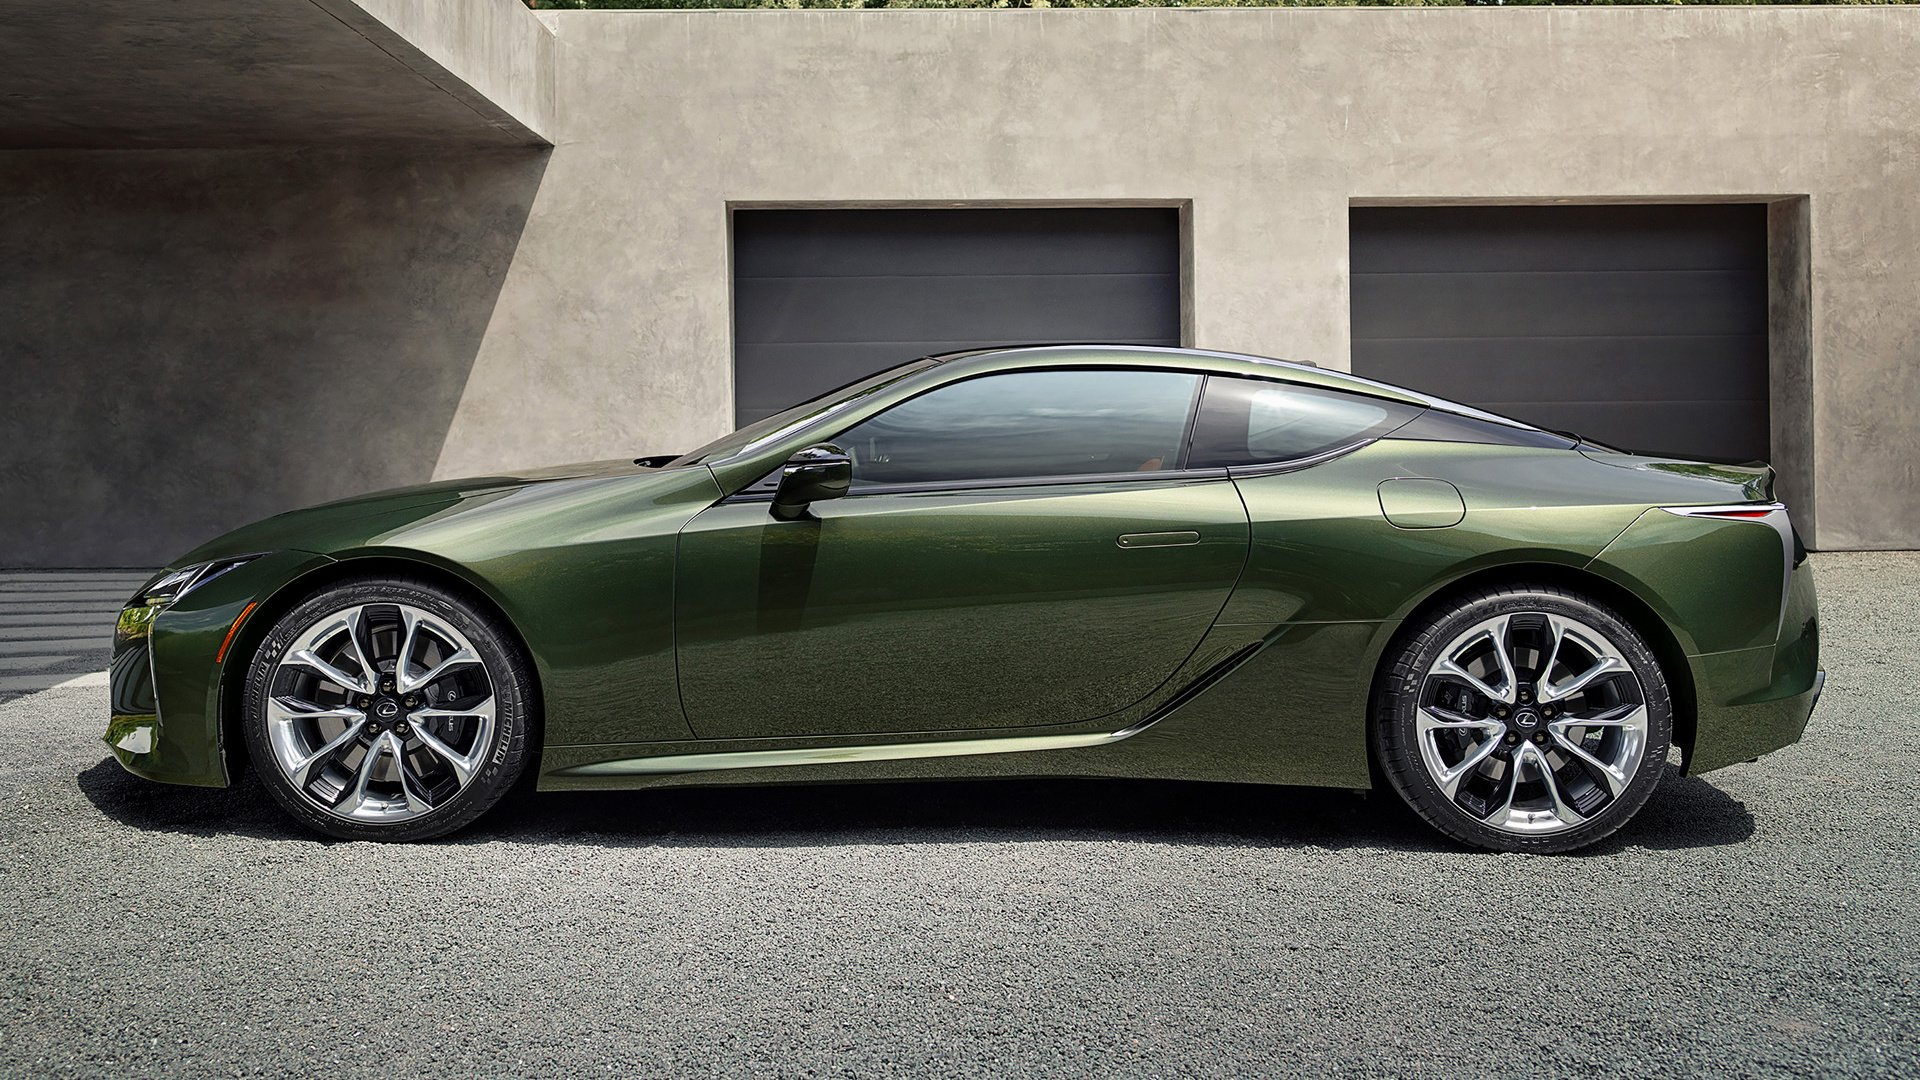 2020 Lexus Lc 500 Inspiration Series Fondo De Pantalla Hd